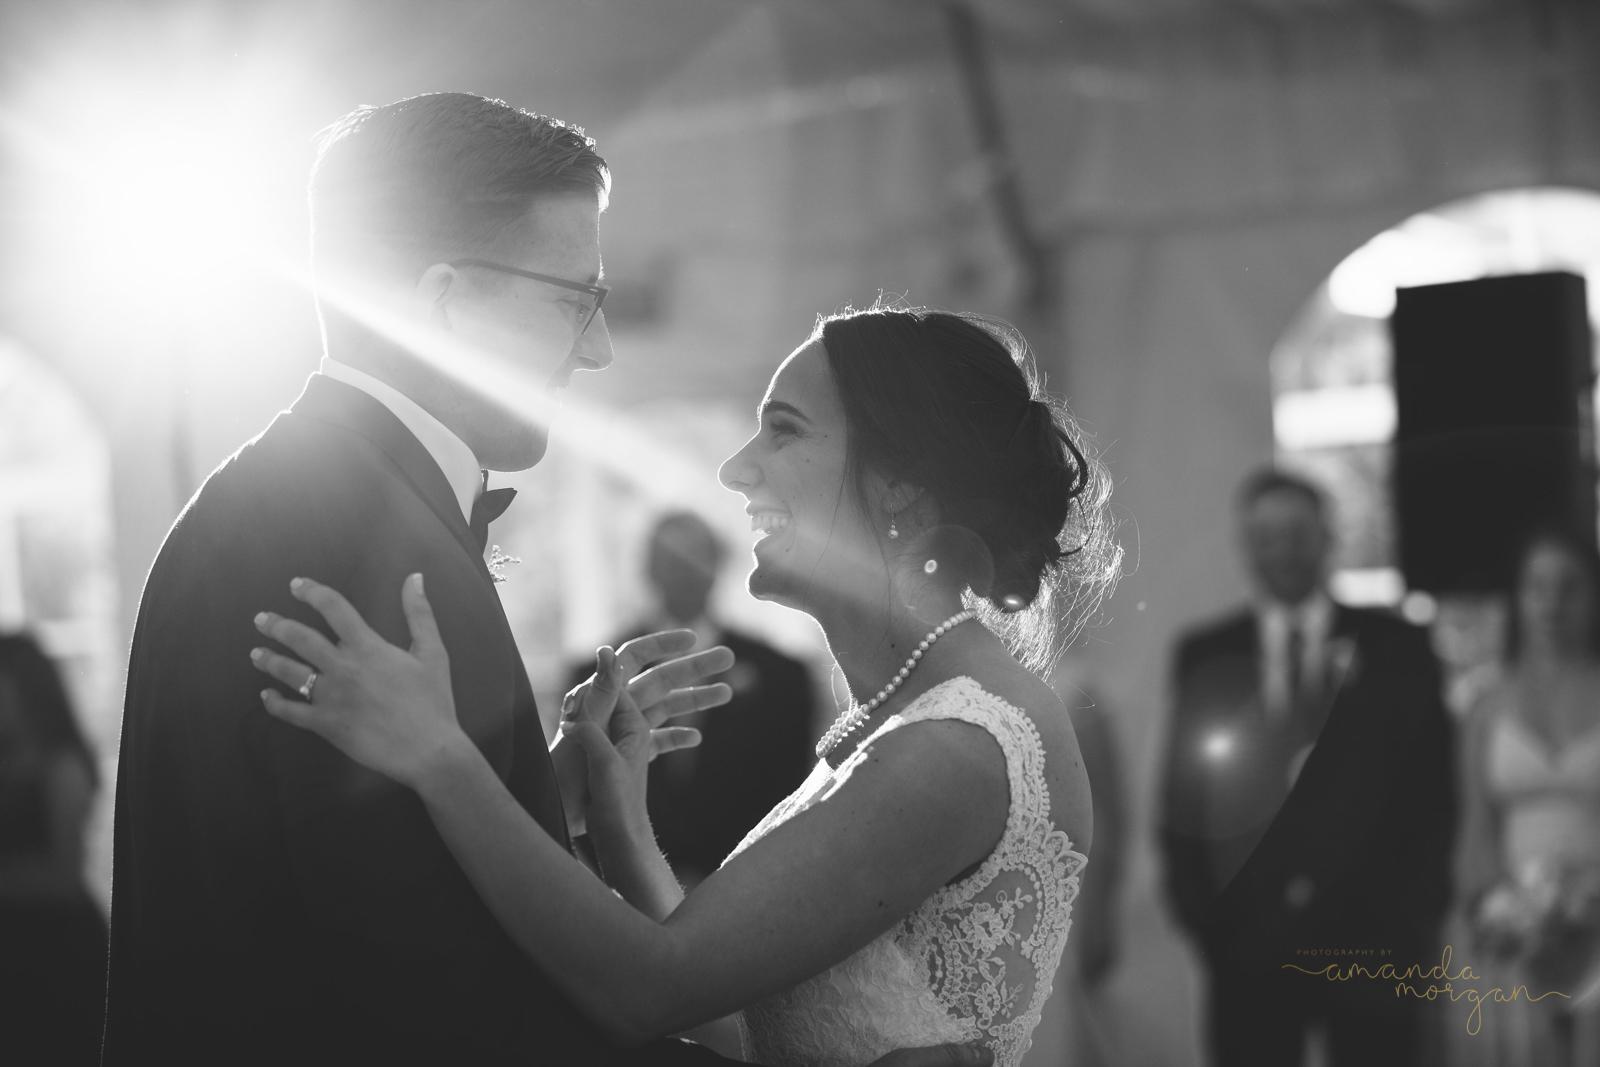 Publick-House-Wedding-Amanda-Morgan-54.jpg